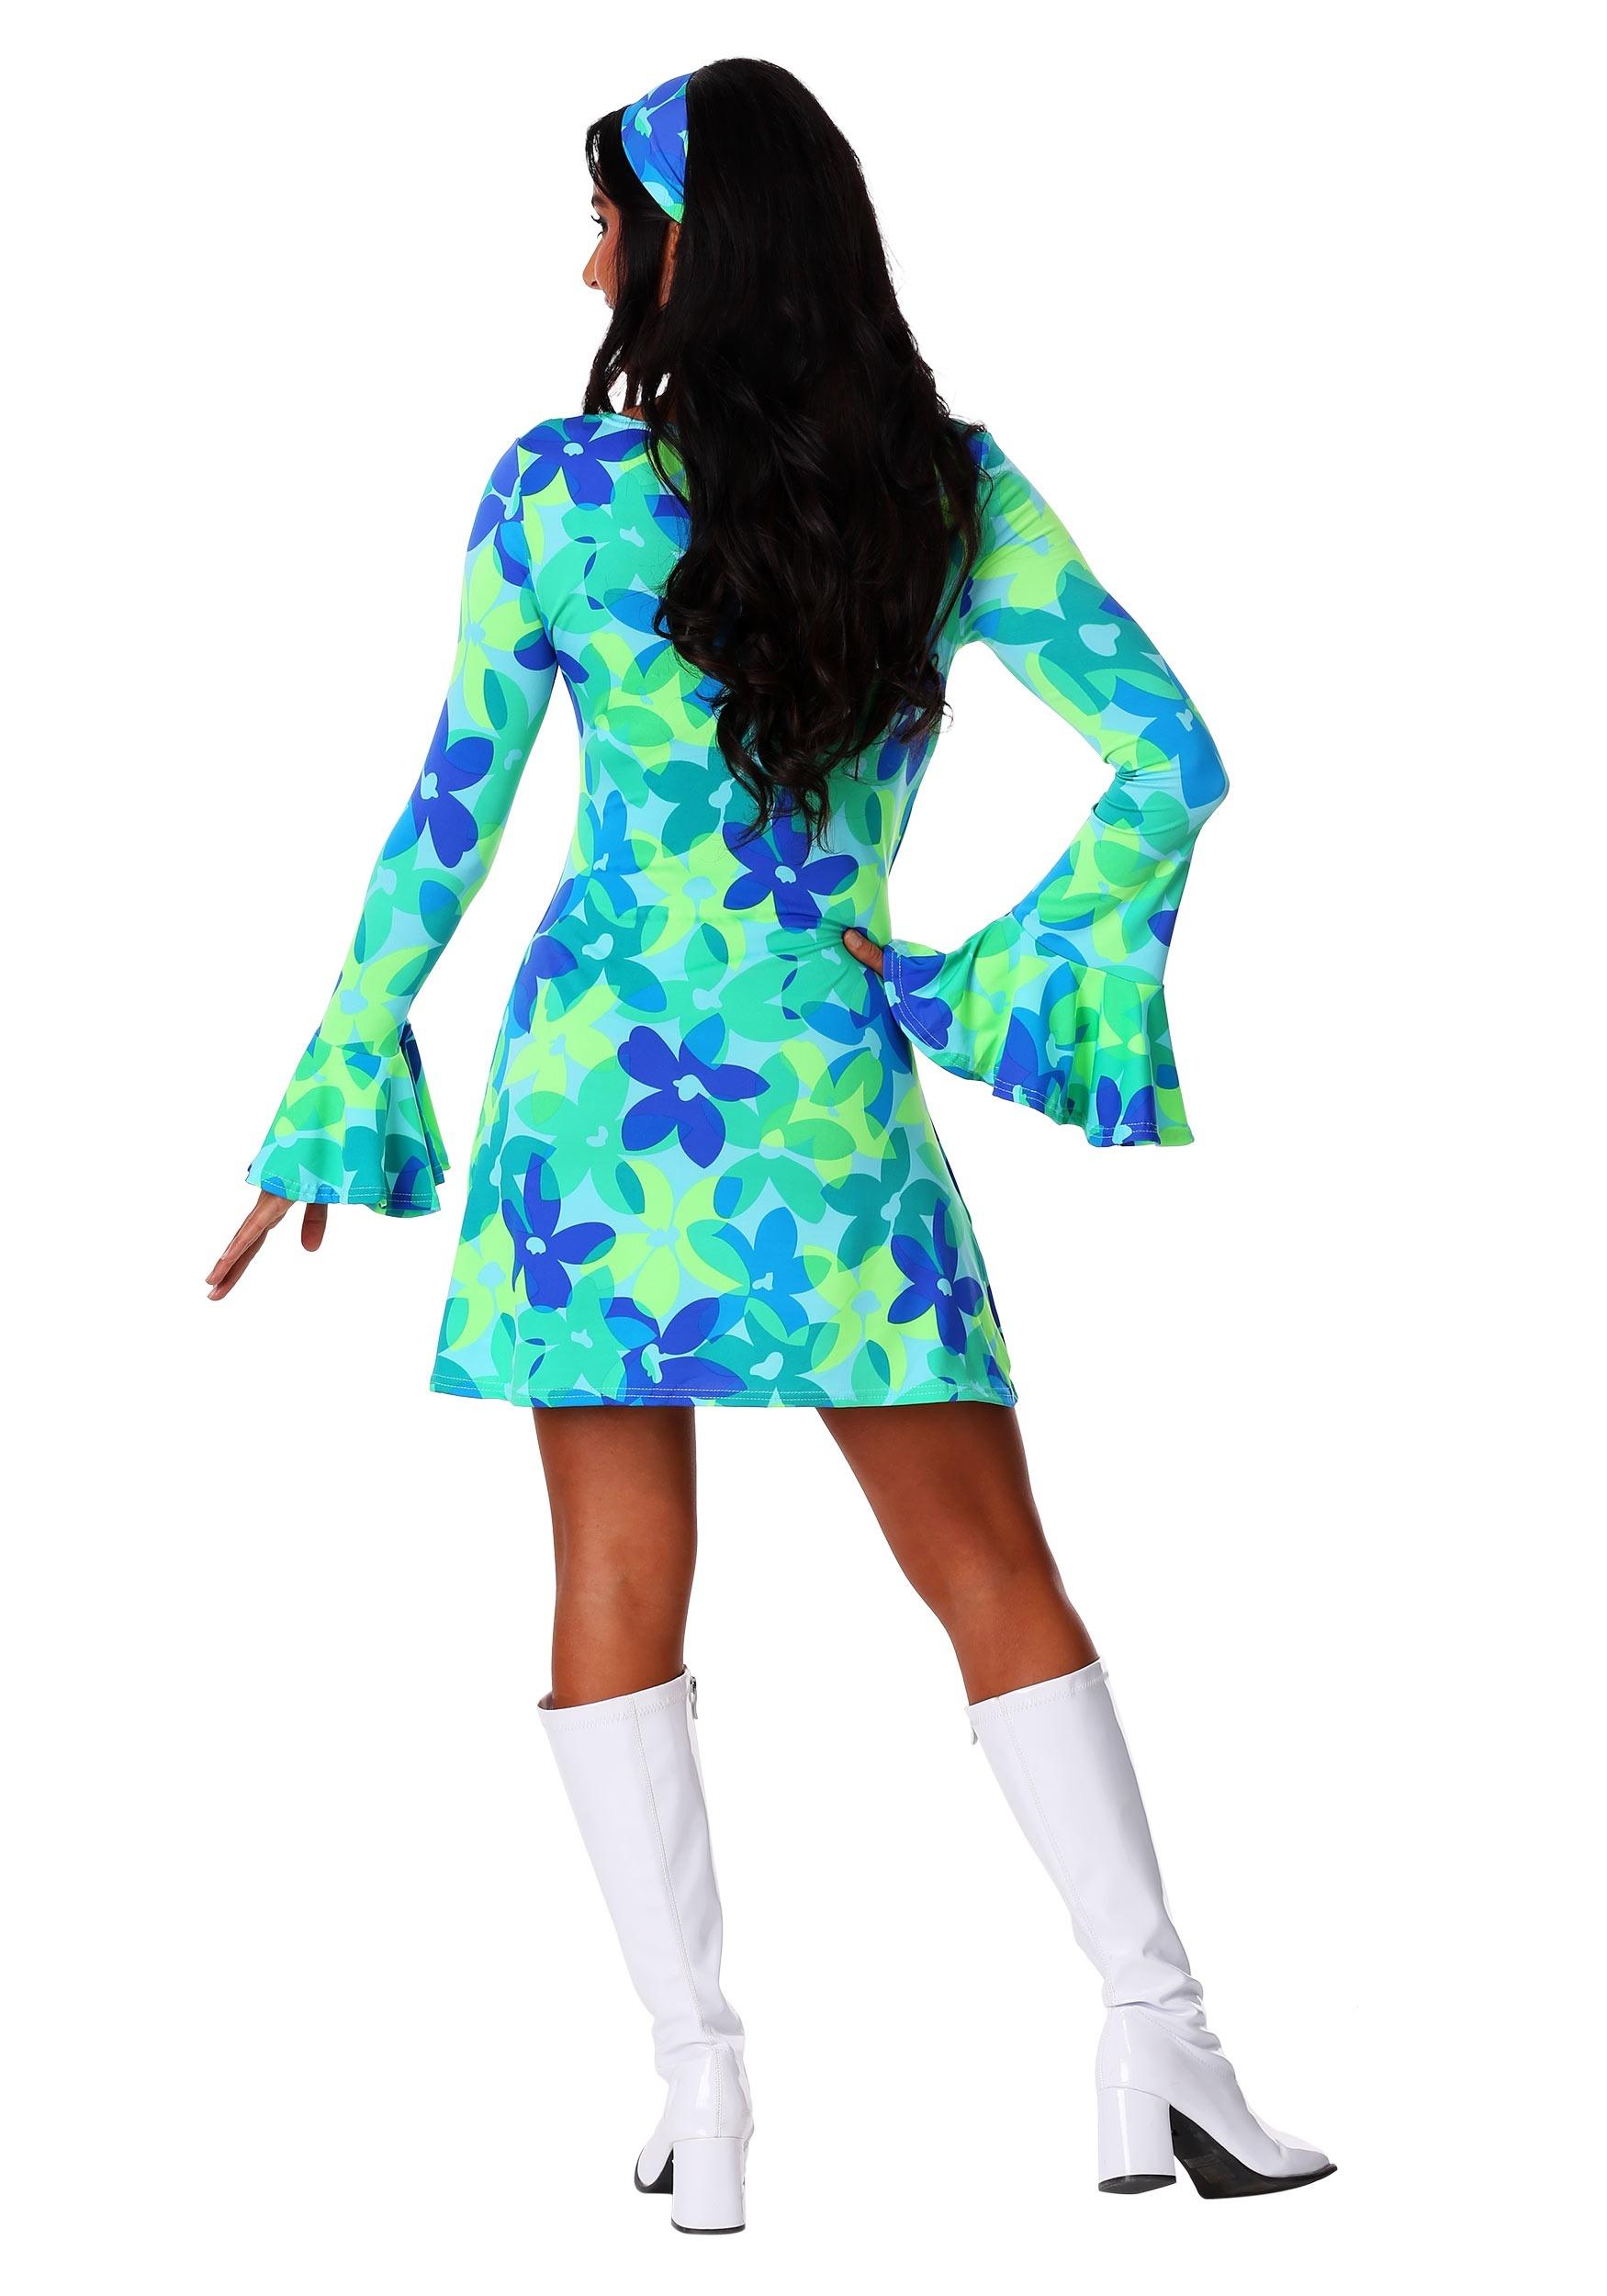 Plus Size 70s Wild Flower Retro Dress Costume for Women